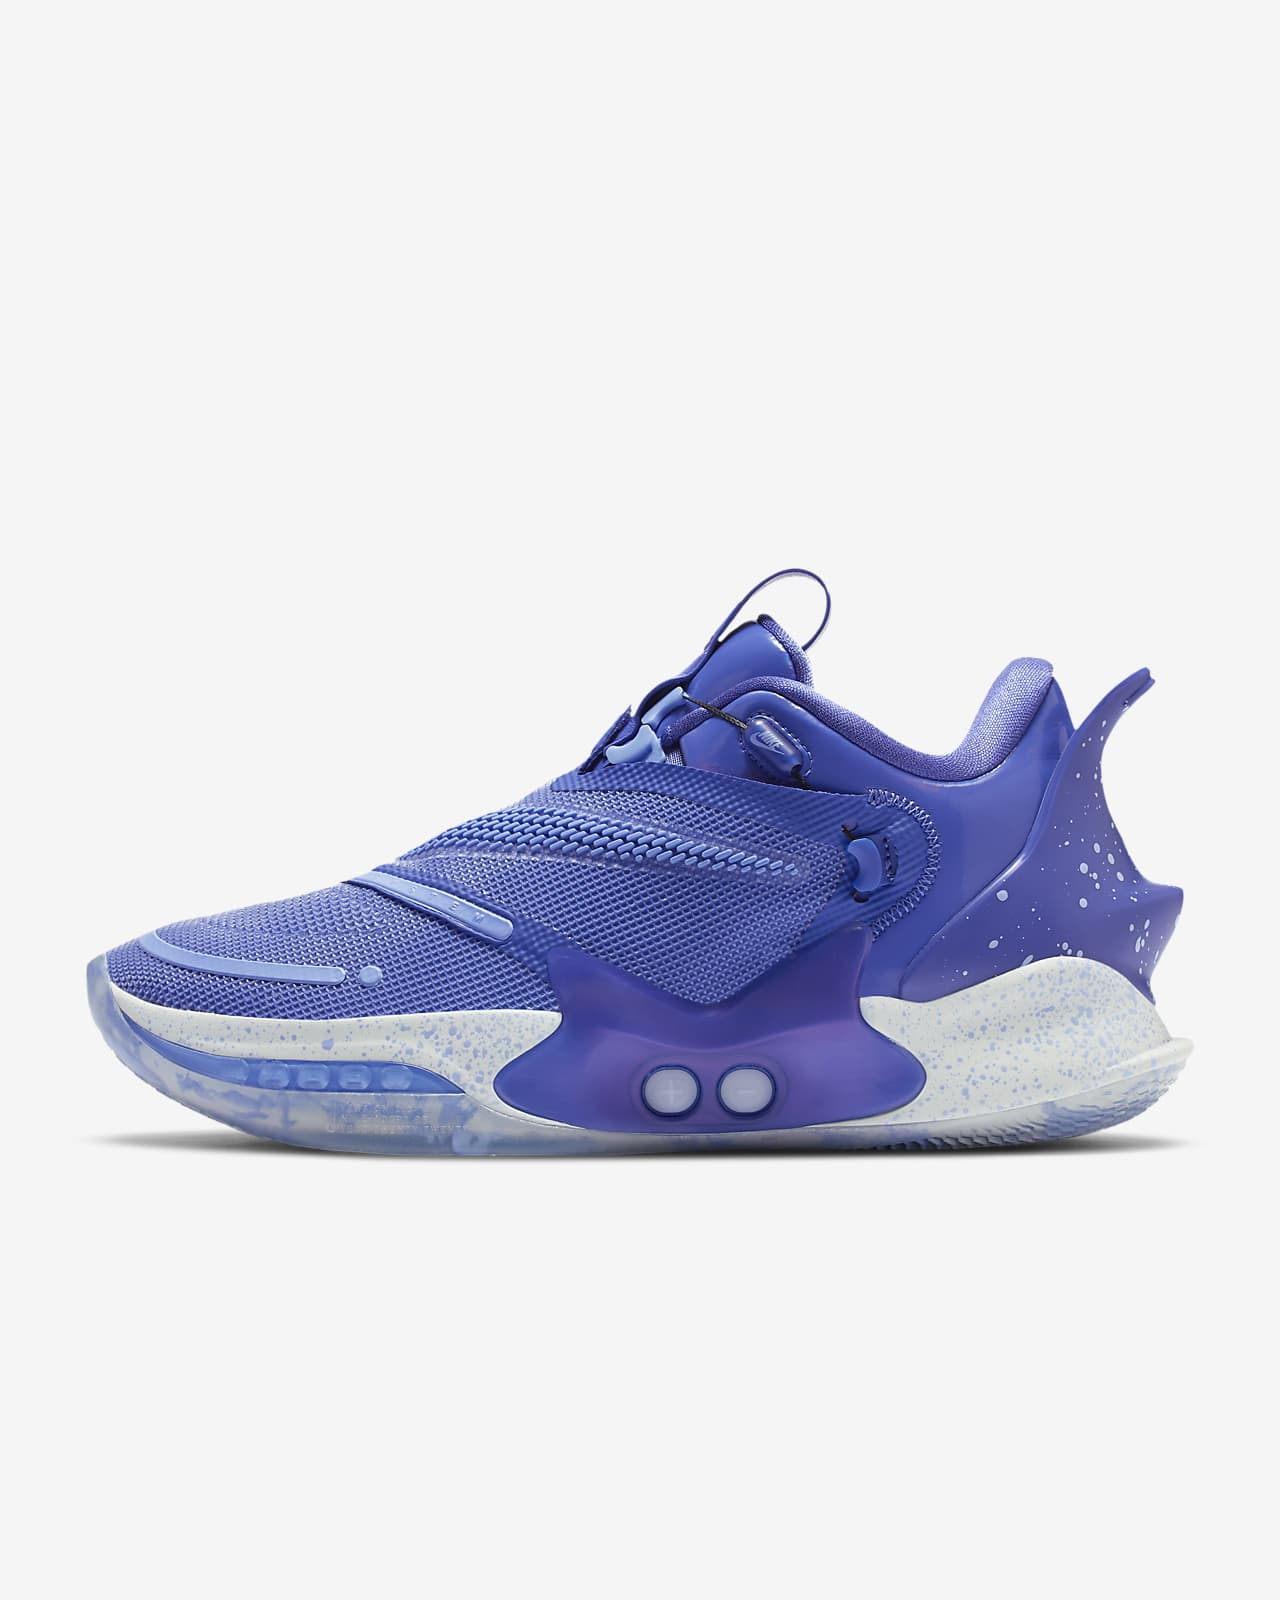 Nike Adapt Bb 2 0 Basketball Shoe Nike Sg